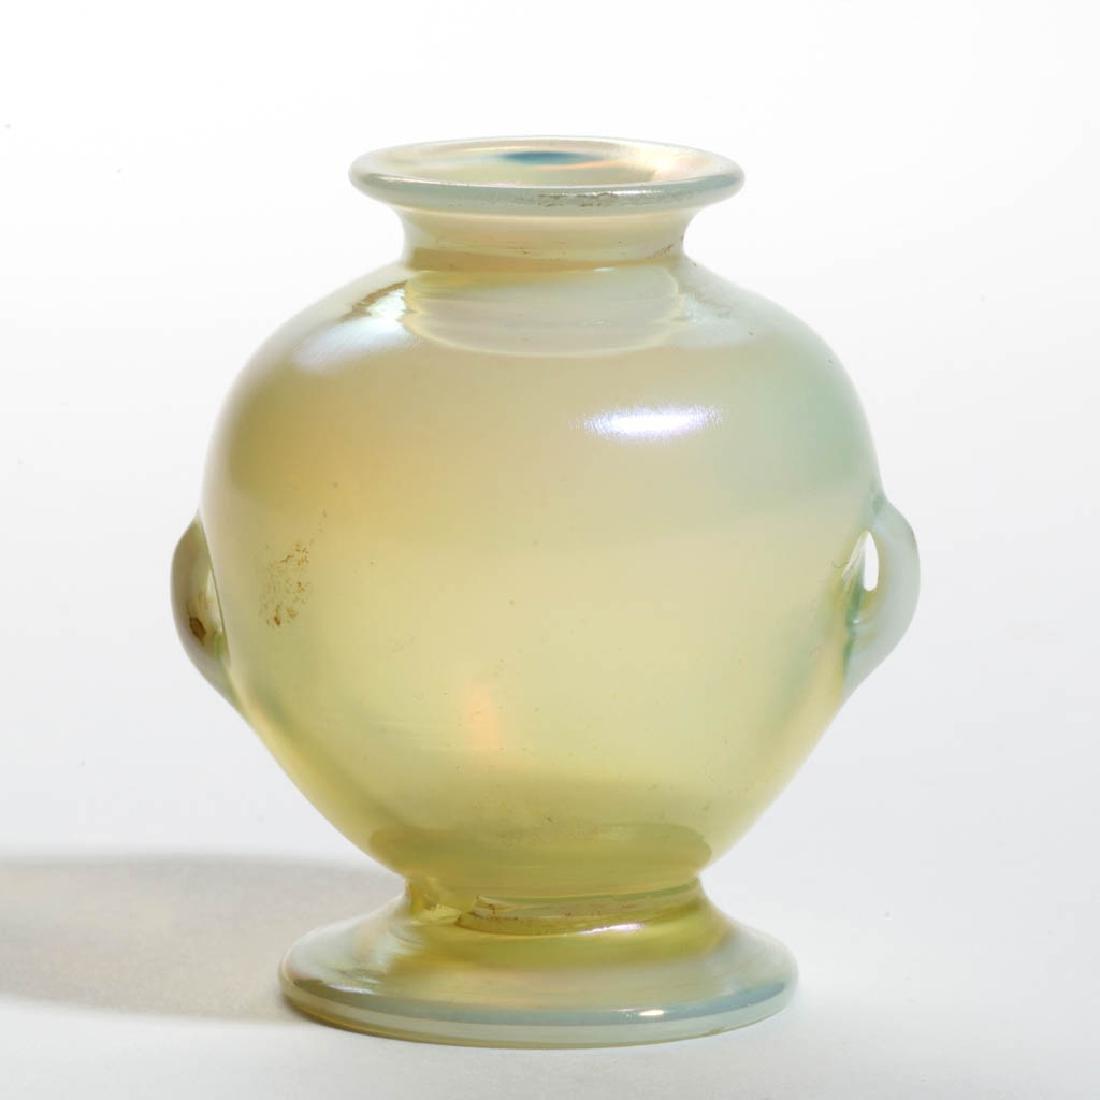 TIFFANY FAVRILE DIMINUTIVE ART GLASS CABINET VASE